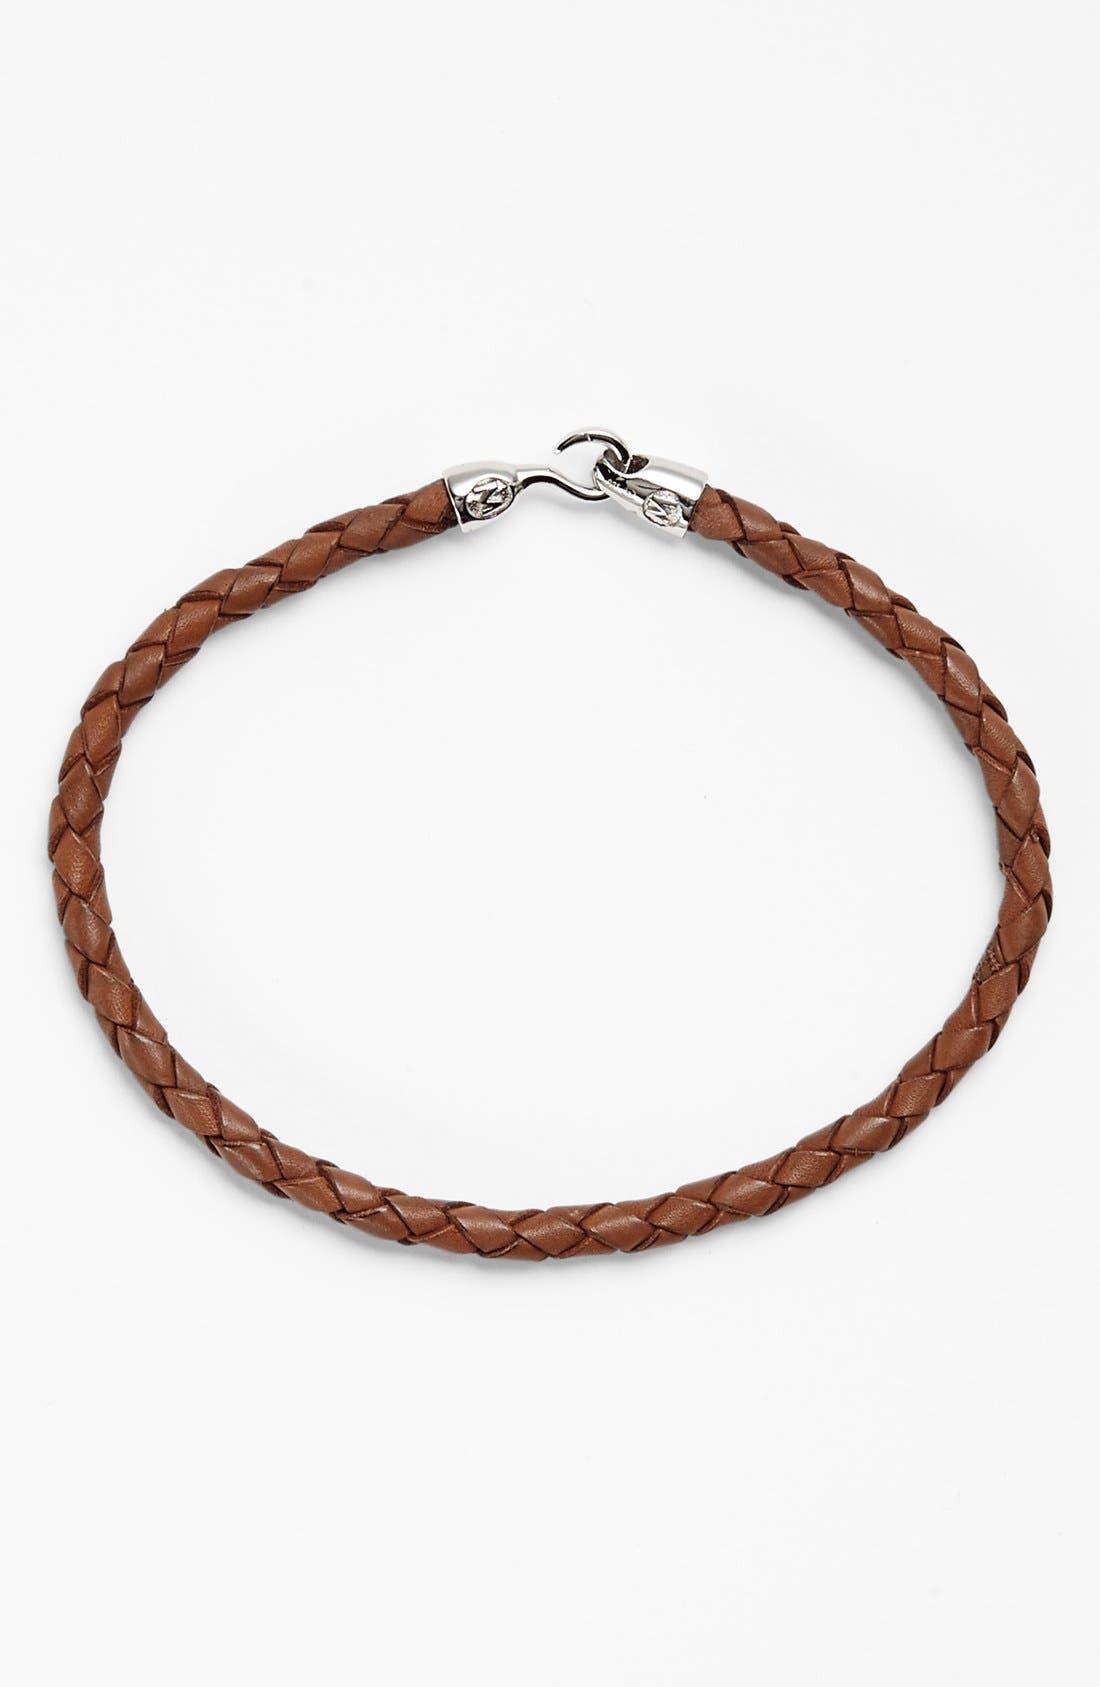 Alternate Image 1 Selected - Mateo Bijoux 'Greek' Braided Leather Bracelet